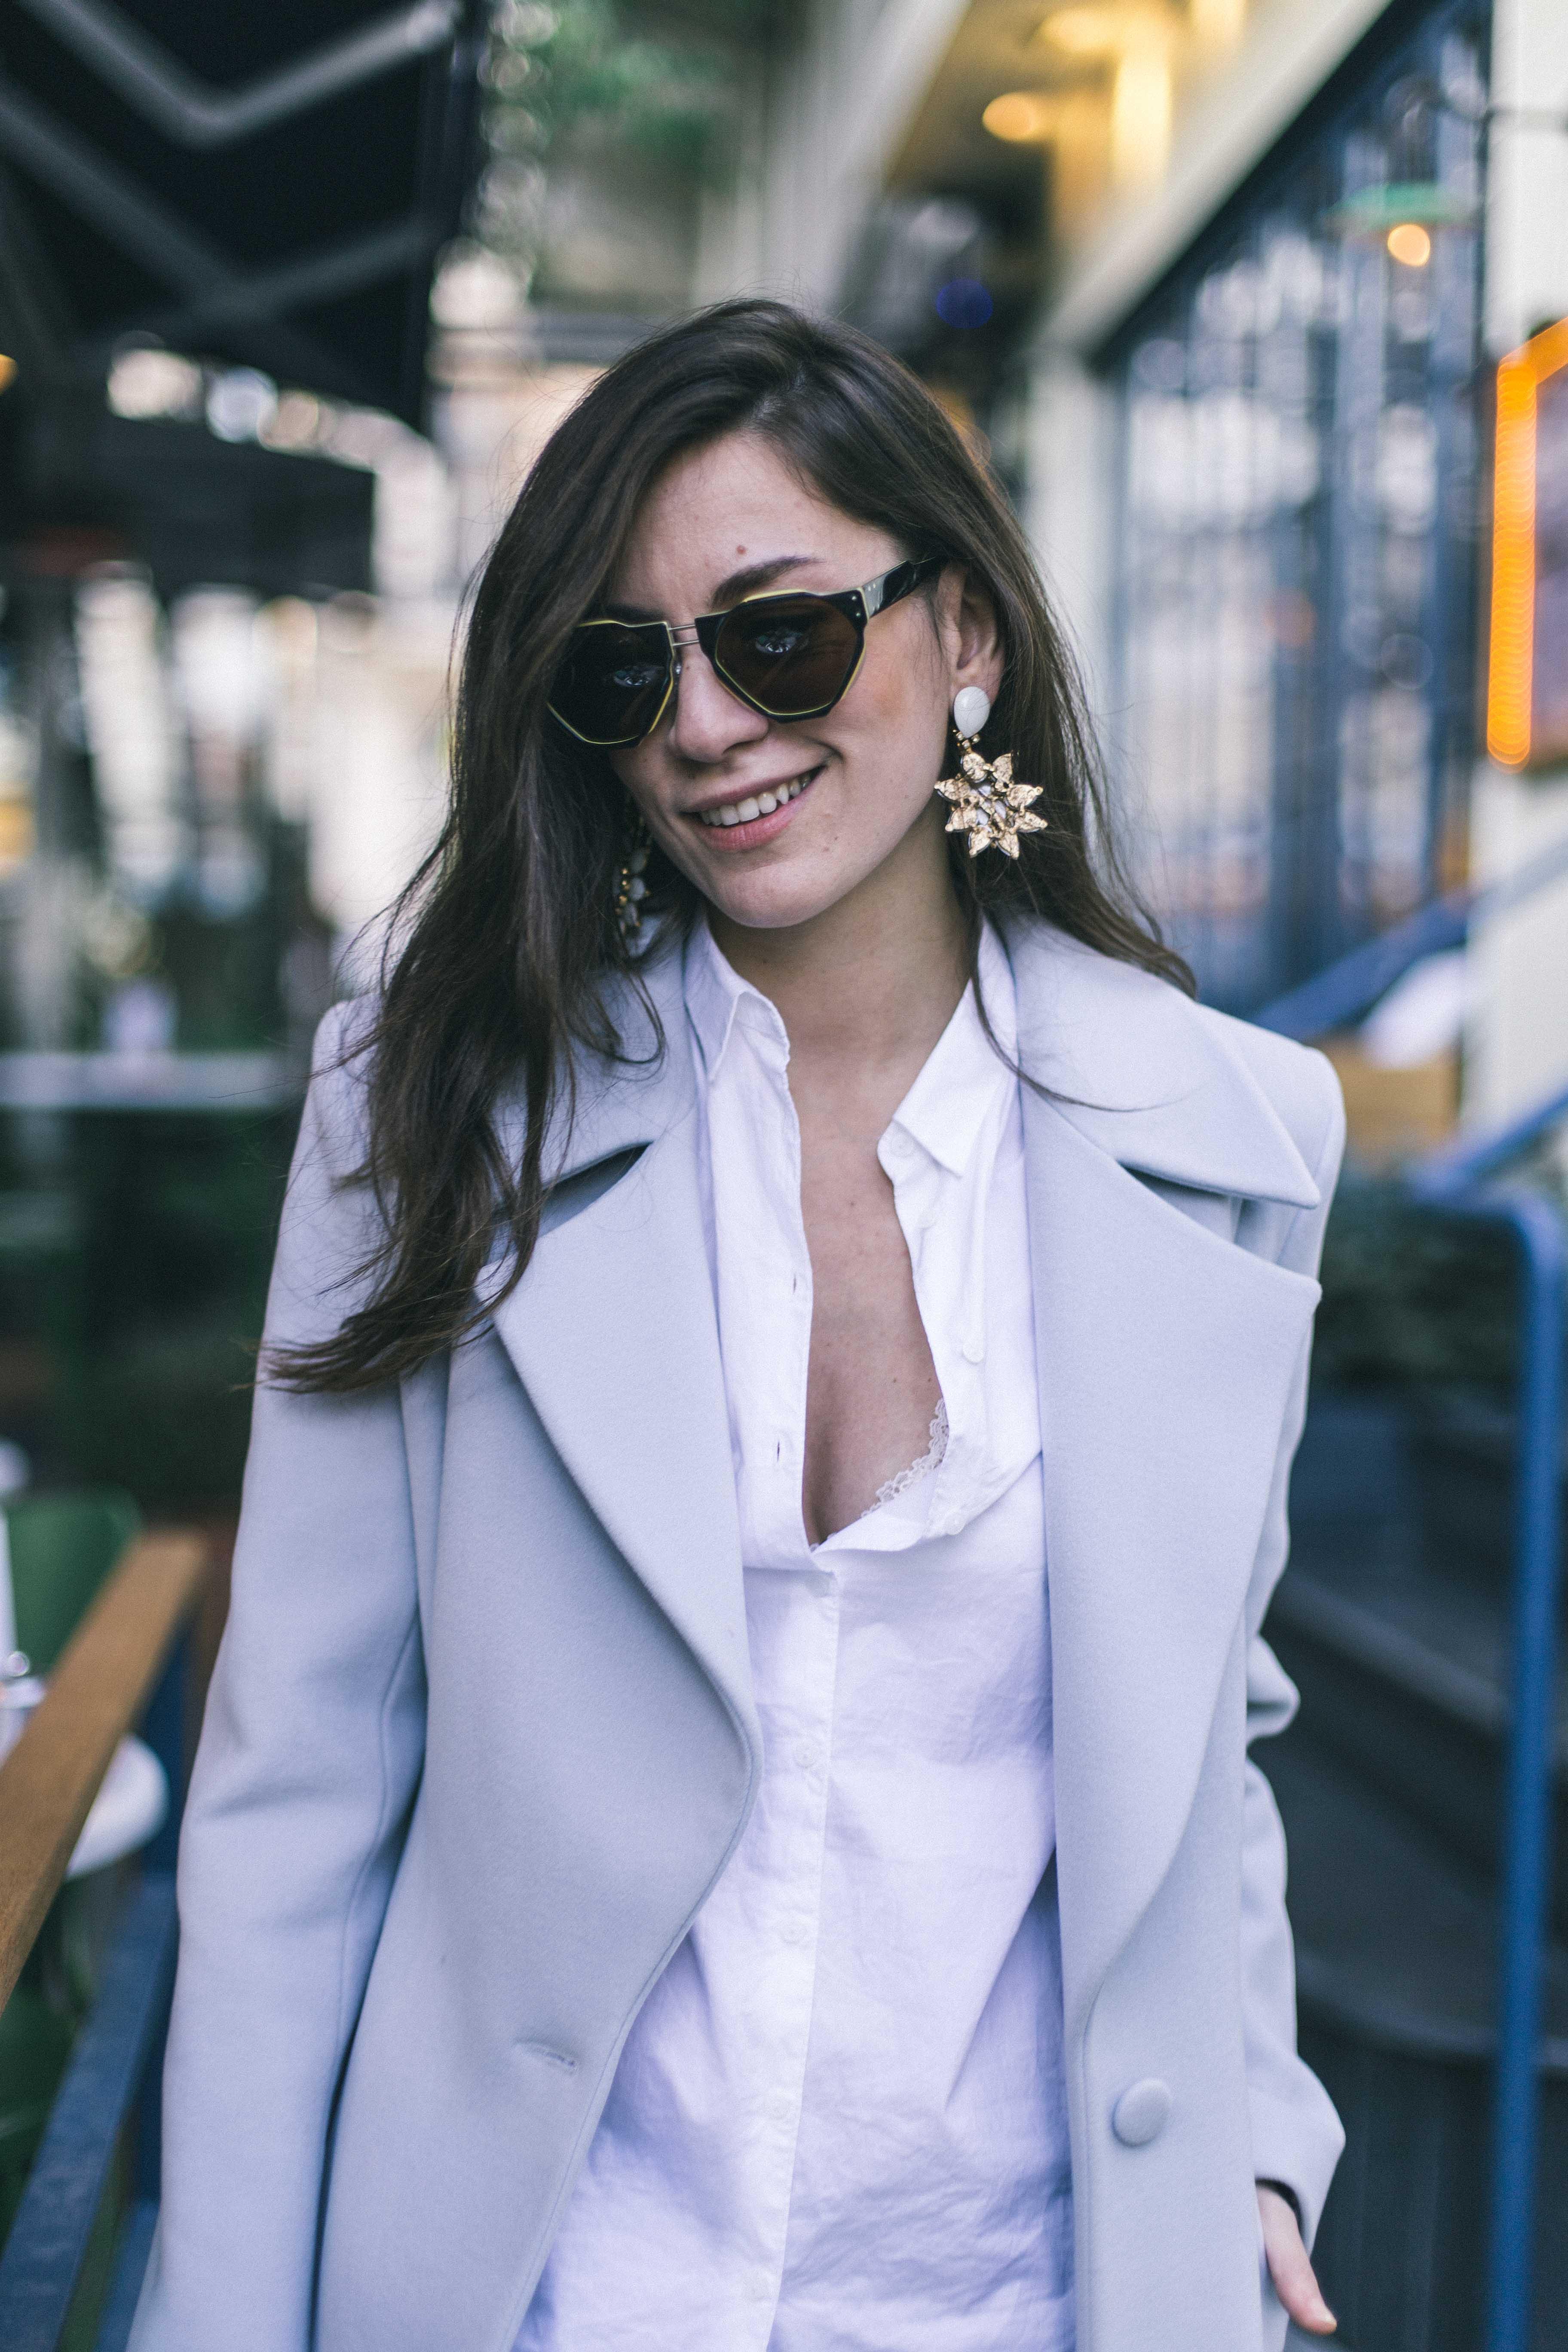 billur saatci, offnegiysem, turkish style blogger, street style, fashion, ootd, blogger, istanbul, mavi, mavi gold, gömlek, beyaz gömlek, dior, fendi, nihan peker